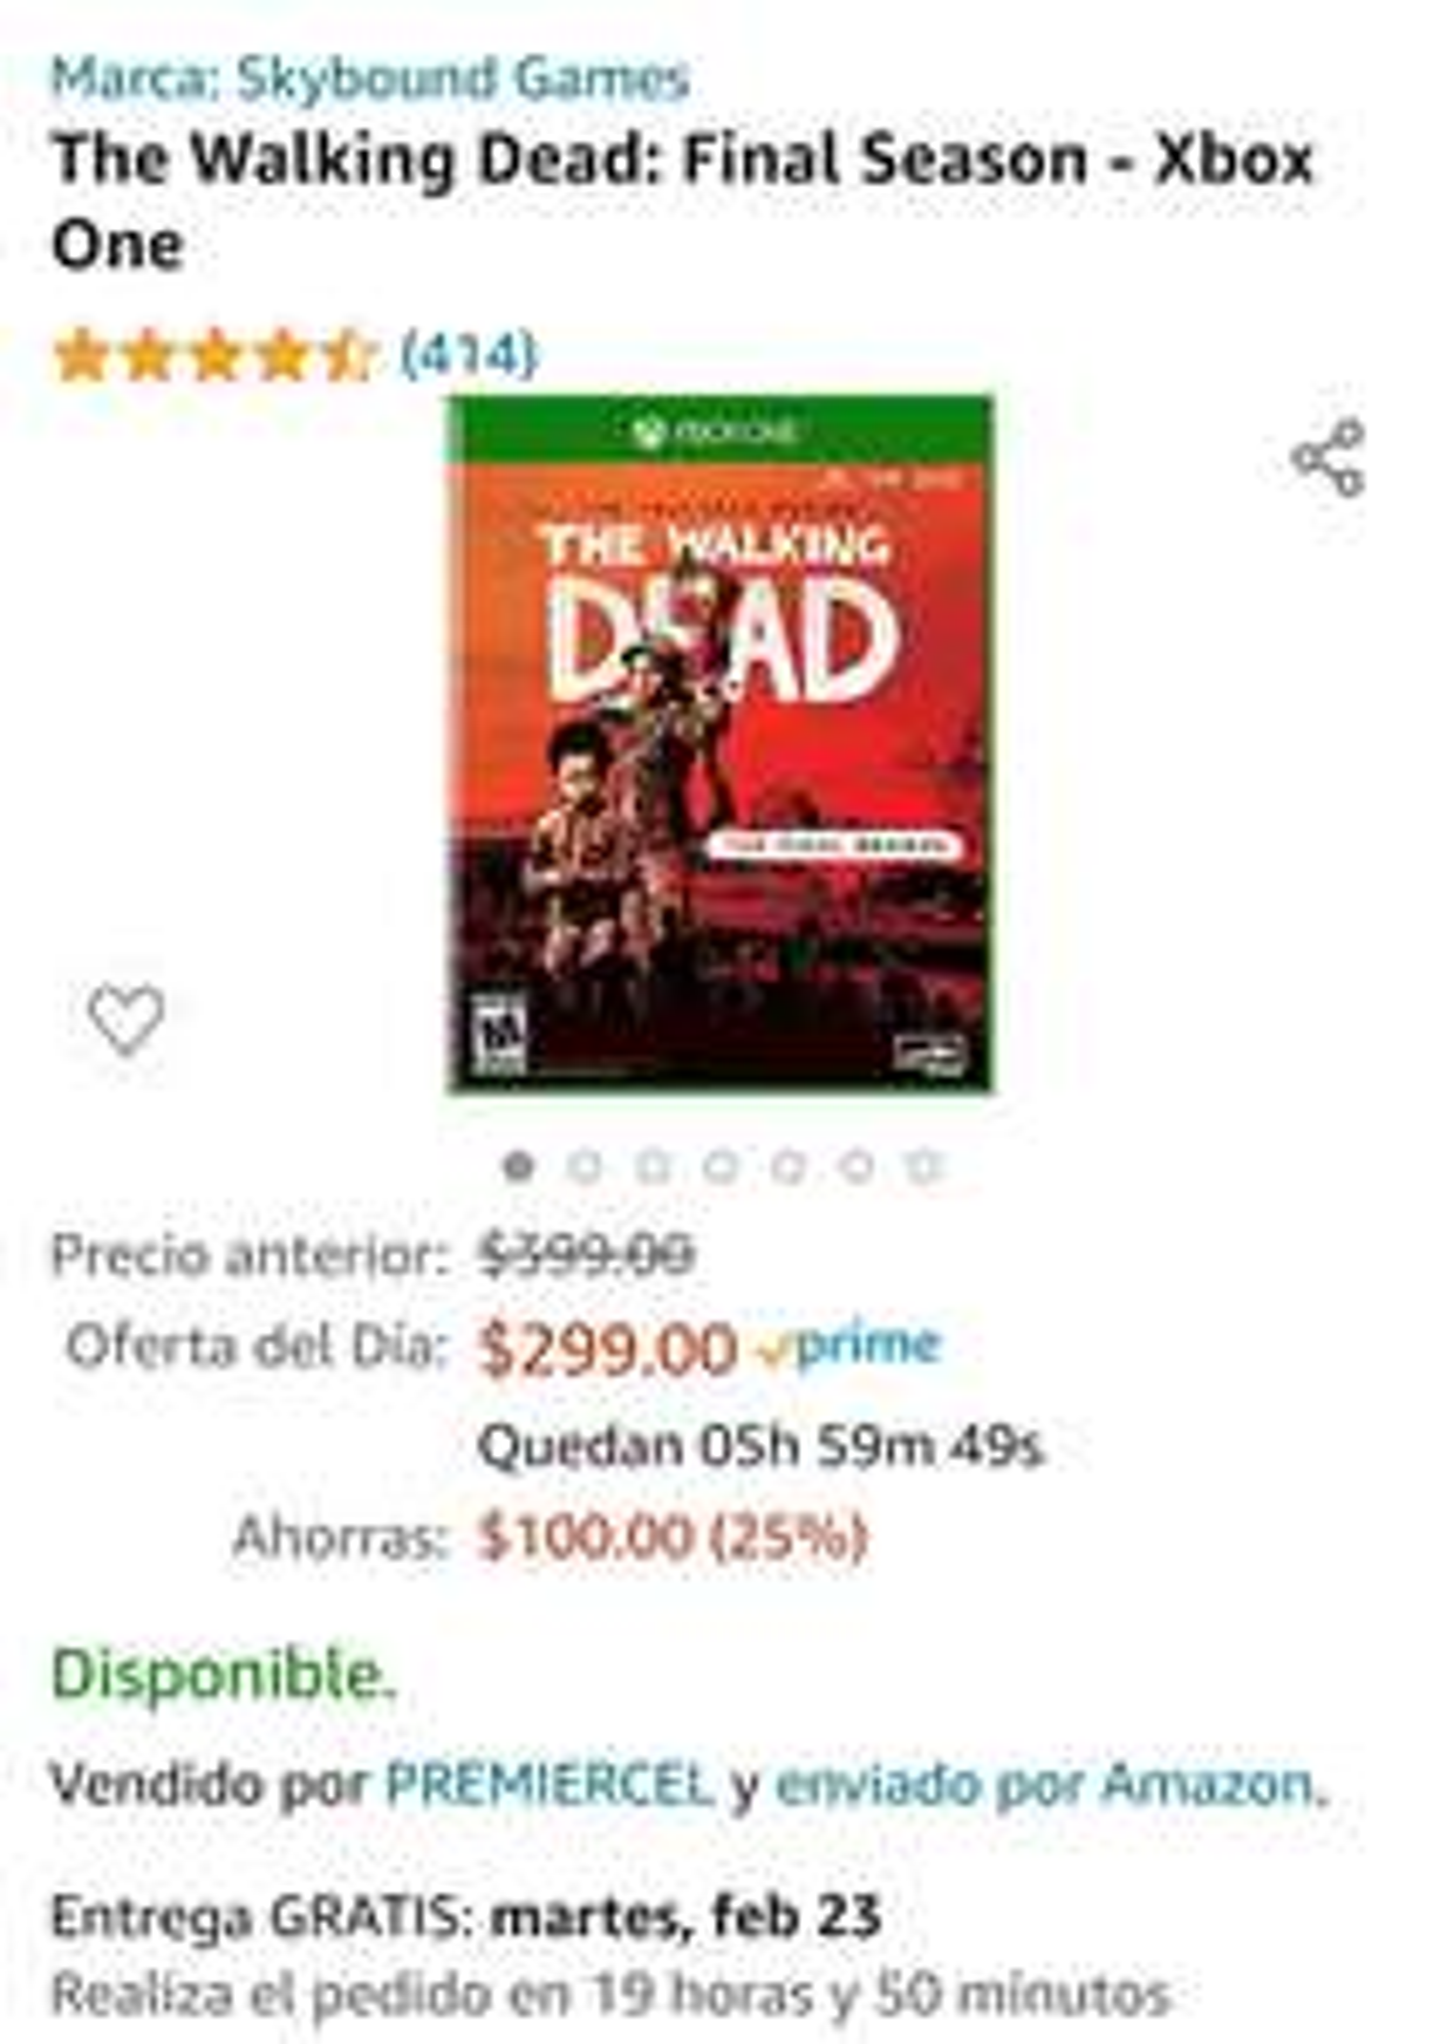 Amazon: The Walking Dead: Final Season - Xbox One